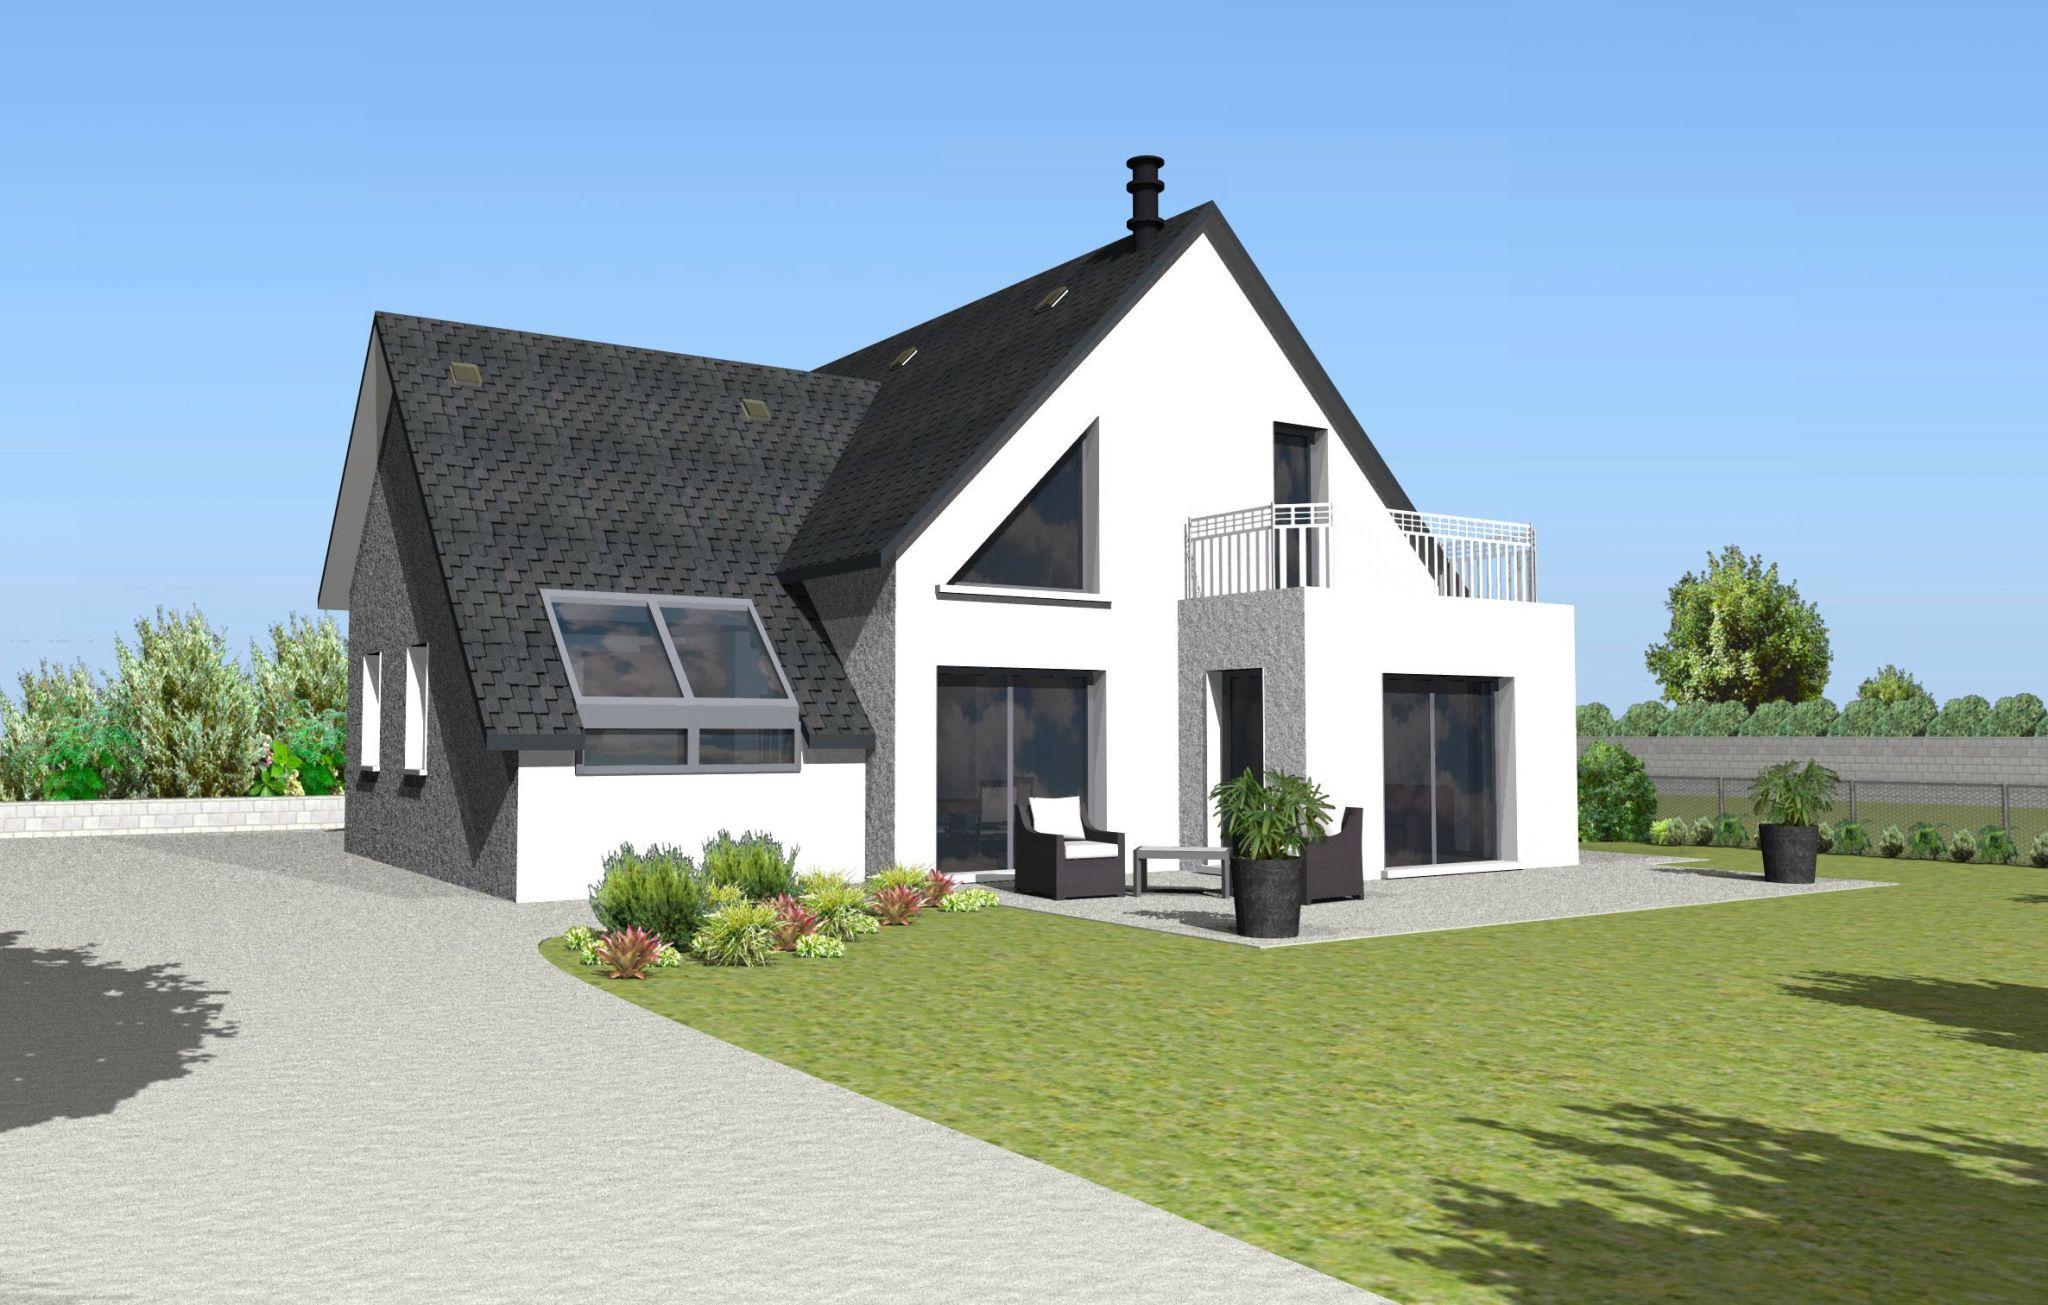 Architecte Jardin 3D Gratuit logiciel creation jardin amenagement jardin 3d gratuit